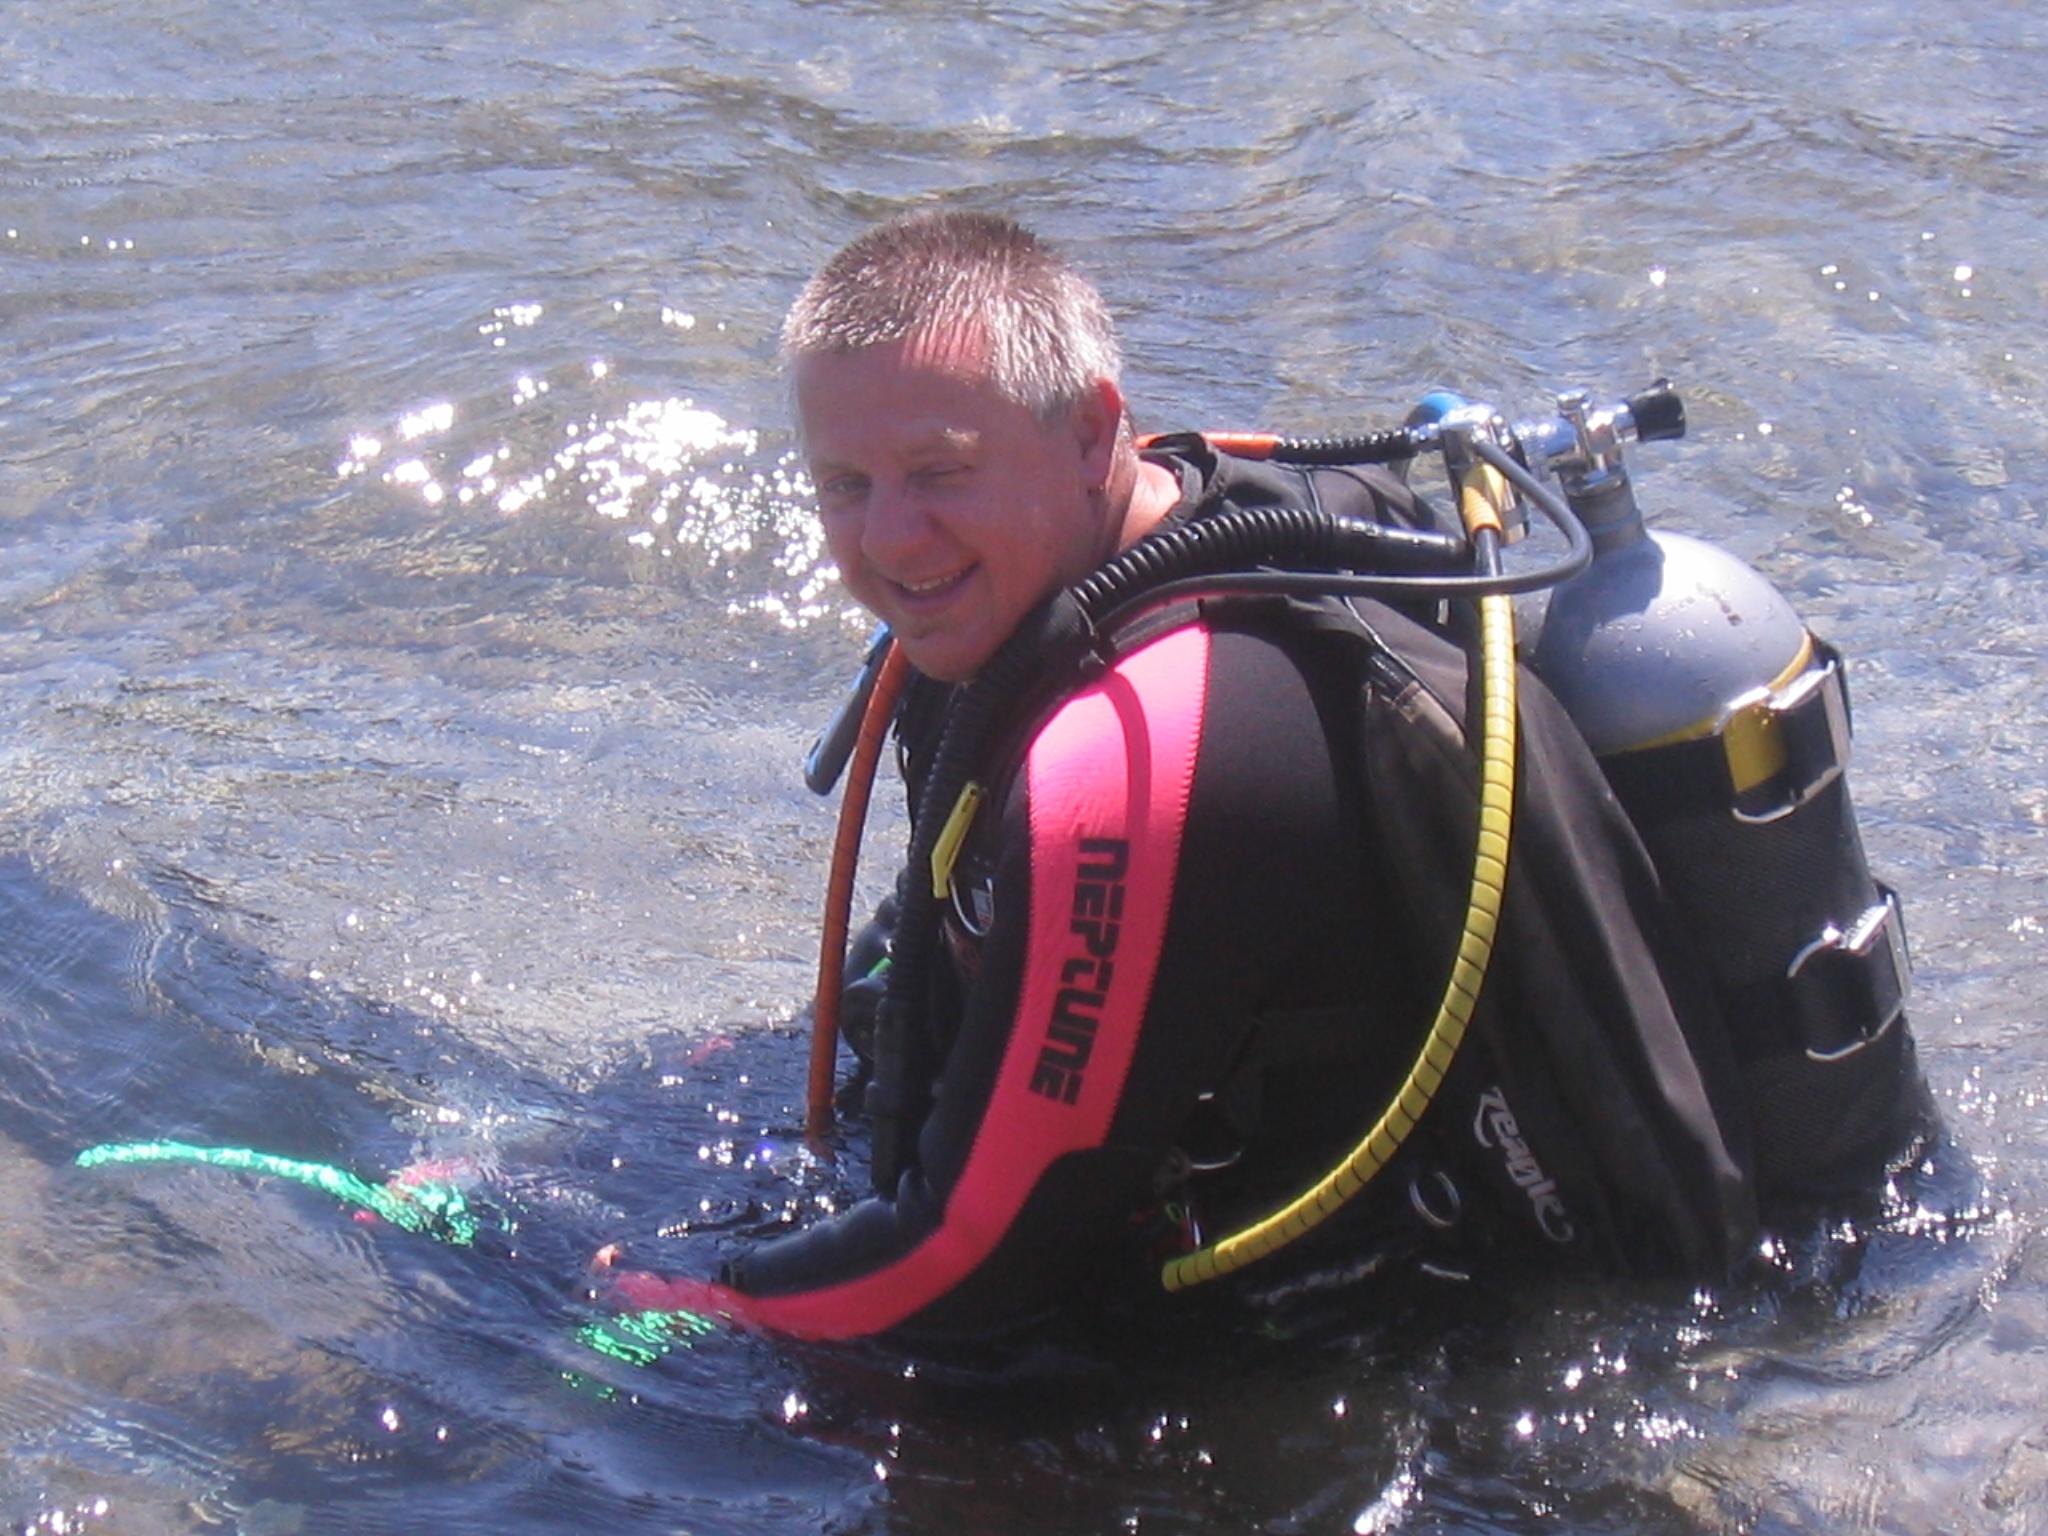 Inspiring Paralympian Bob Staddon Q and A